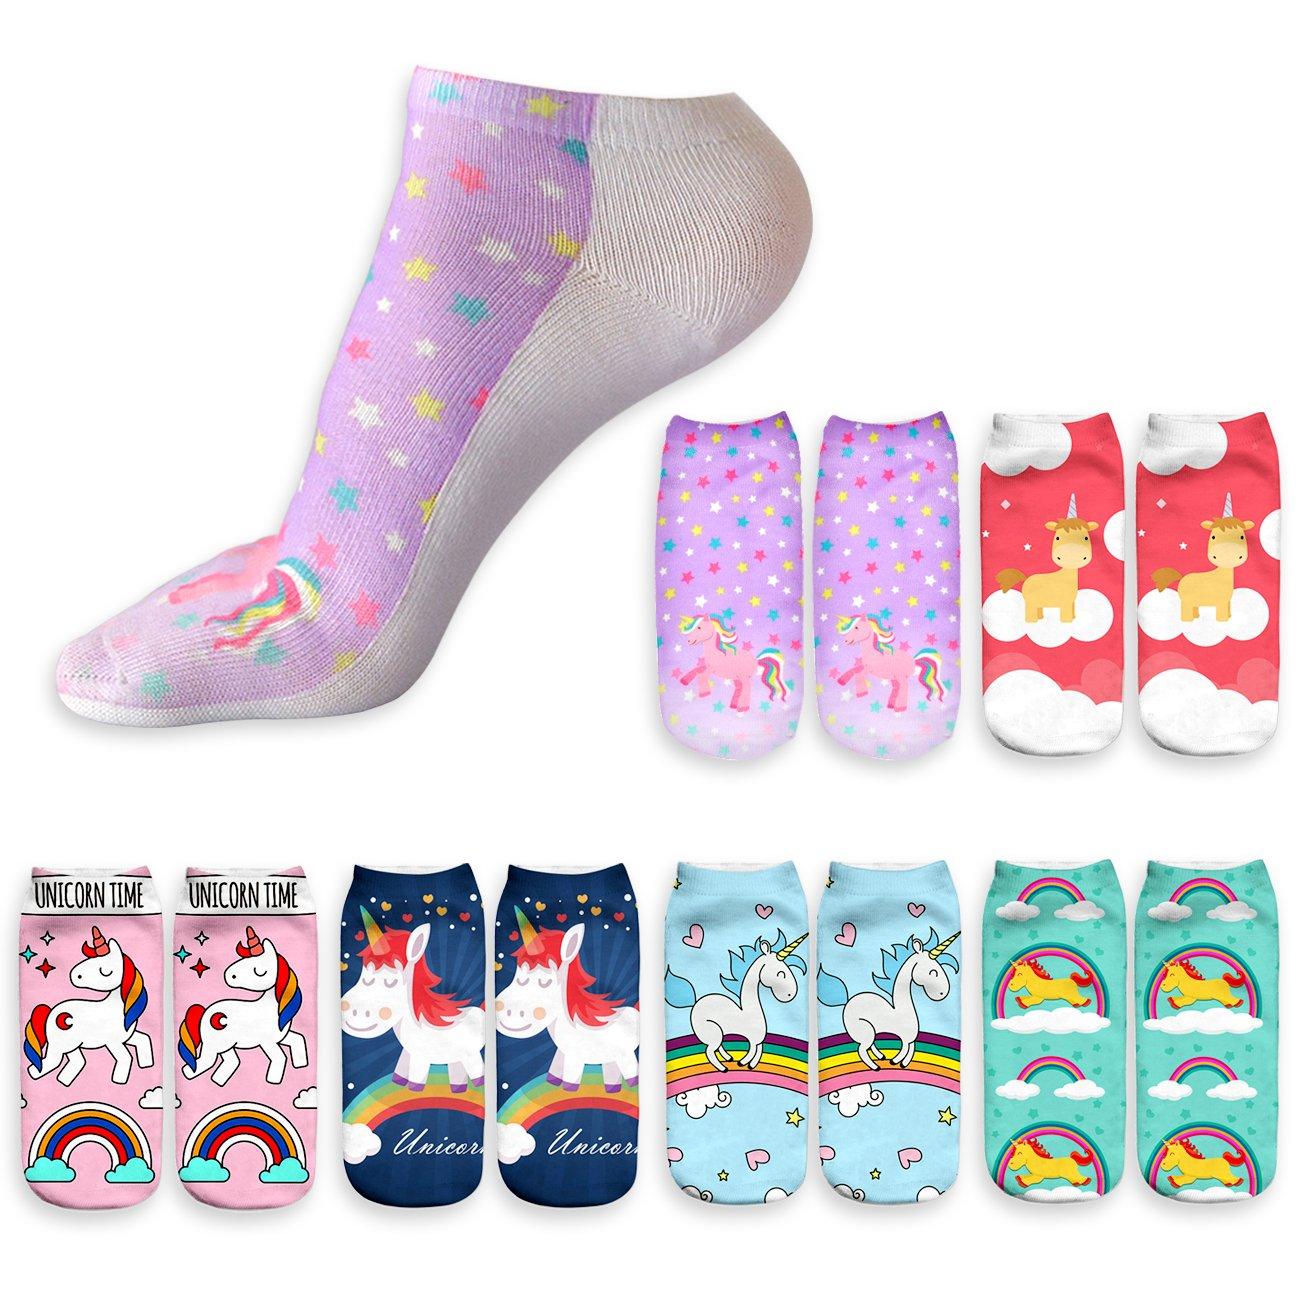 DRESHOW Funny Ankle Socks Womens No Show Cute Unicorn Cartoon Socks for Teen Girls 3D Print Horse Socks Pack 2/6 SO0021-2